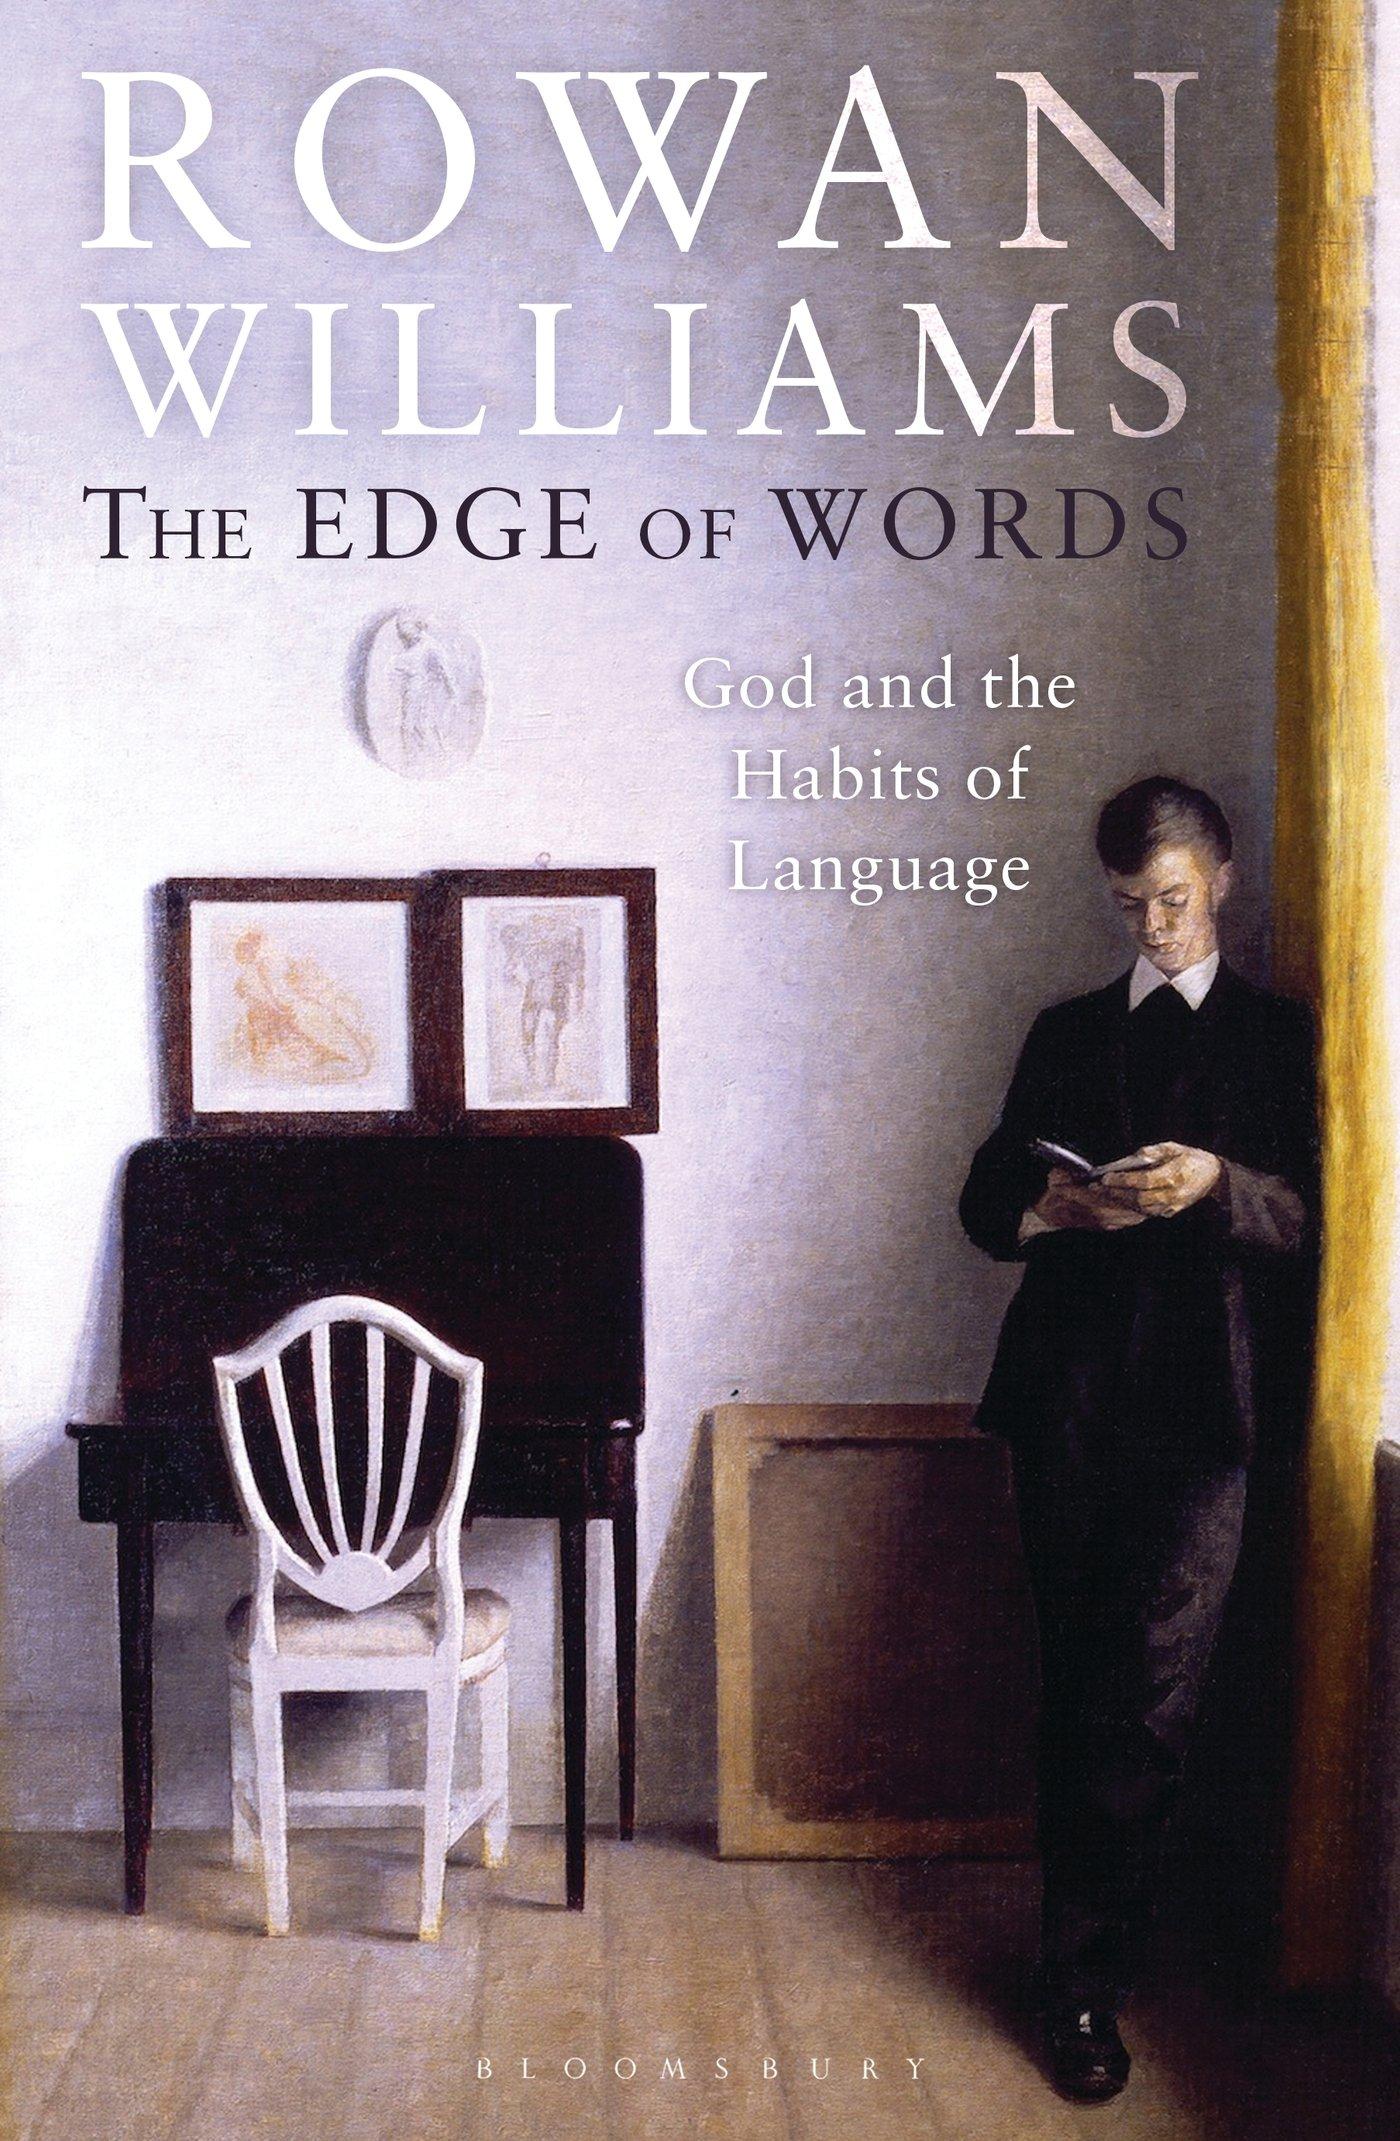 Ege speaking 2015 360 language программу